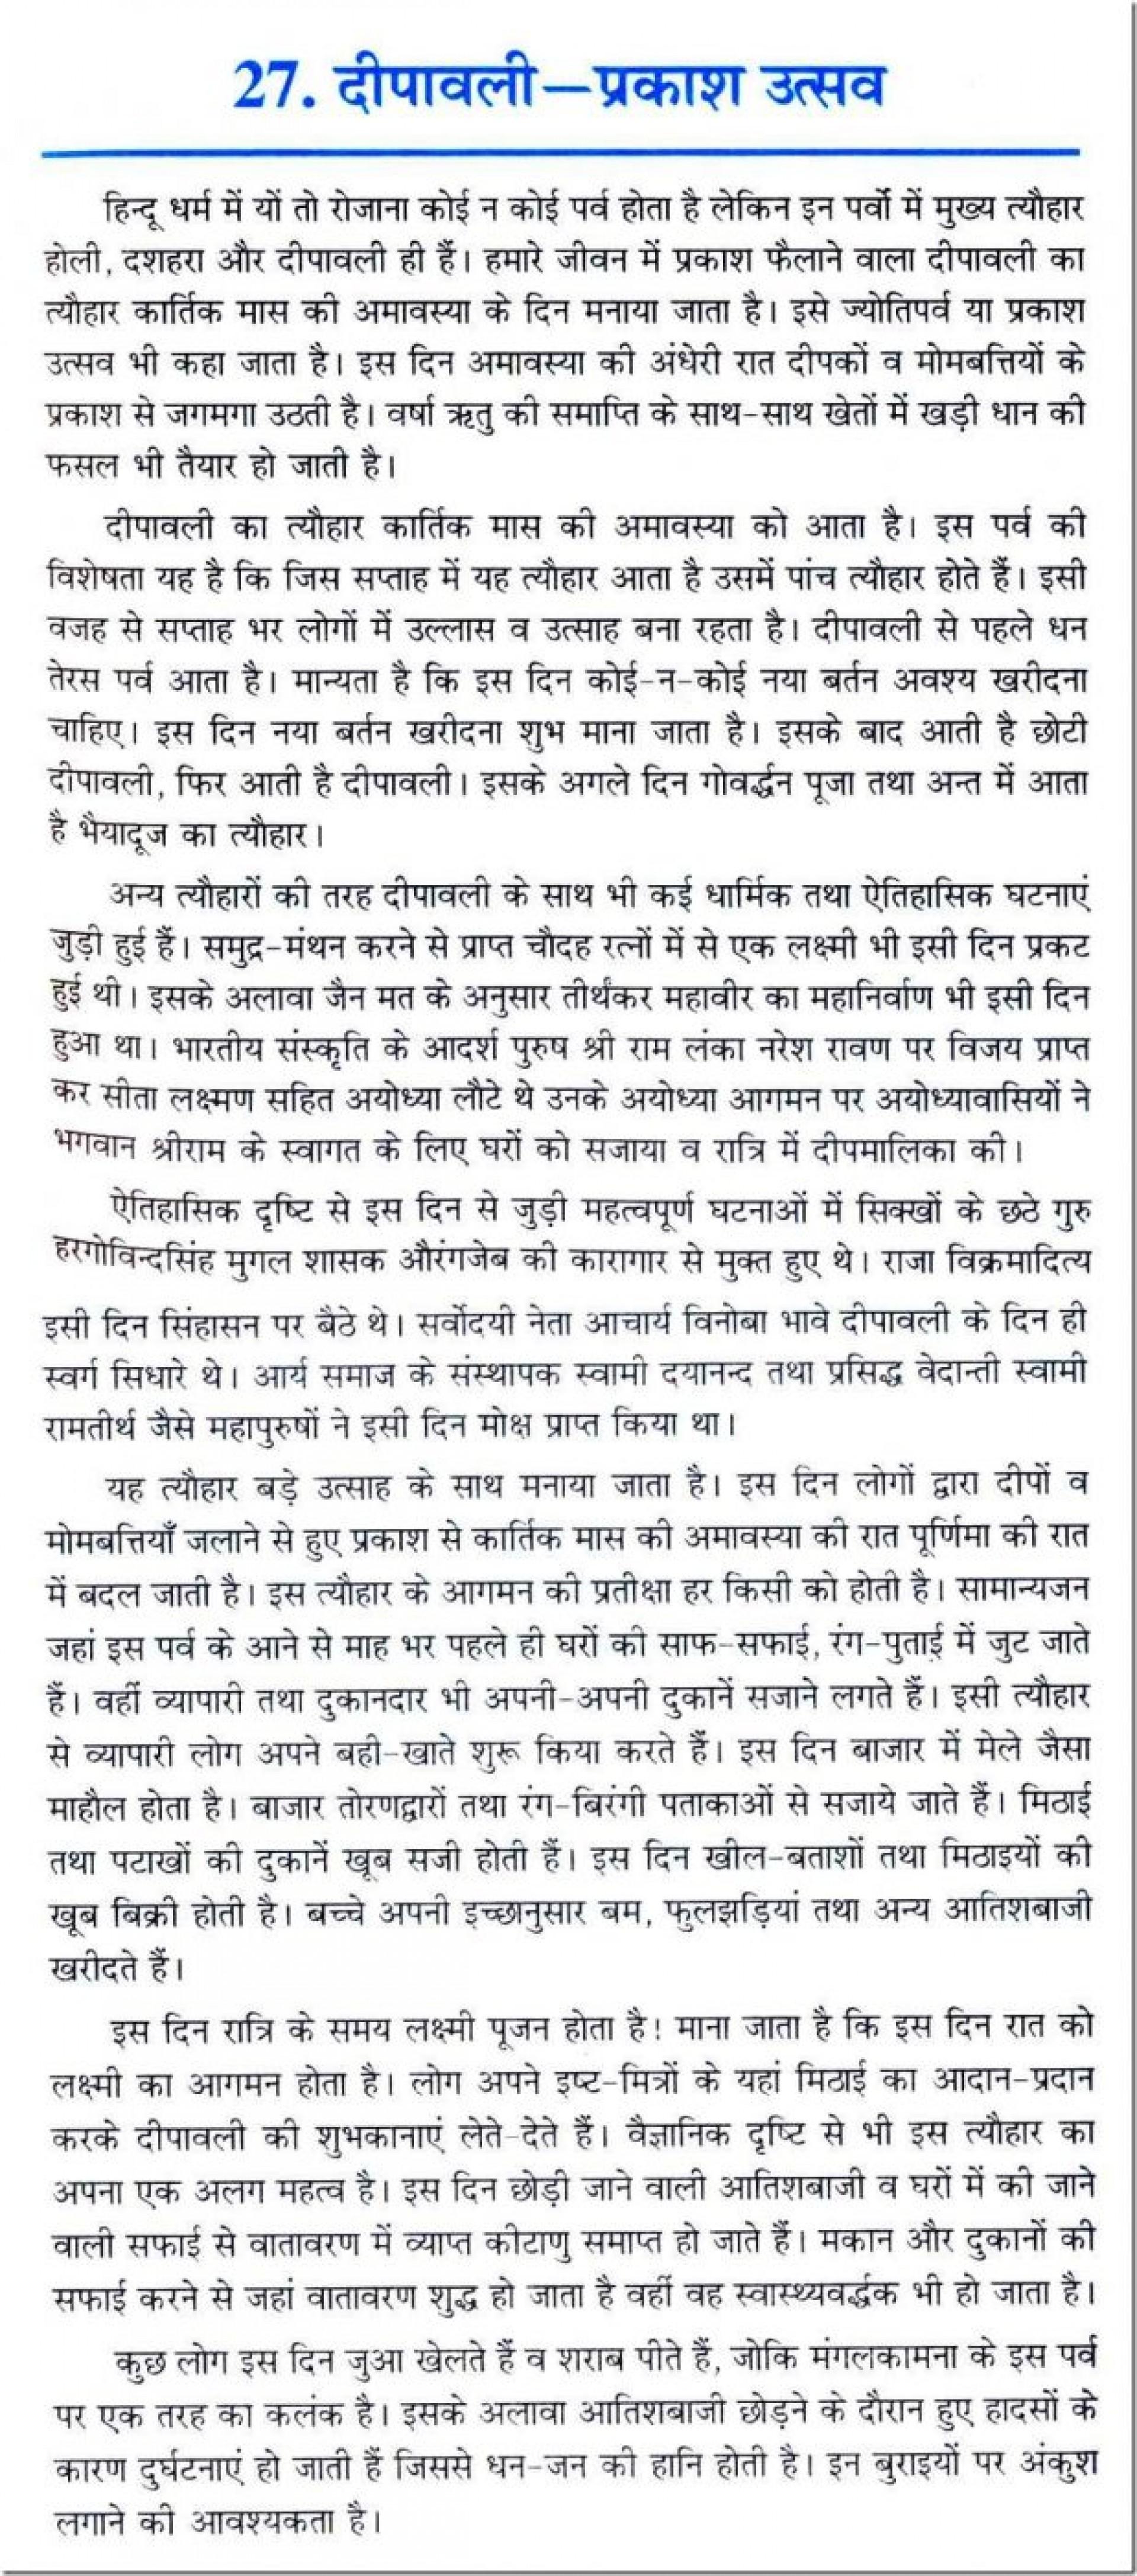 Diwali festival essay marathi language